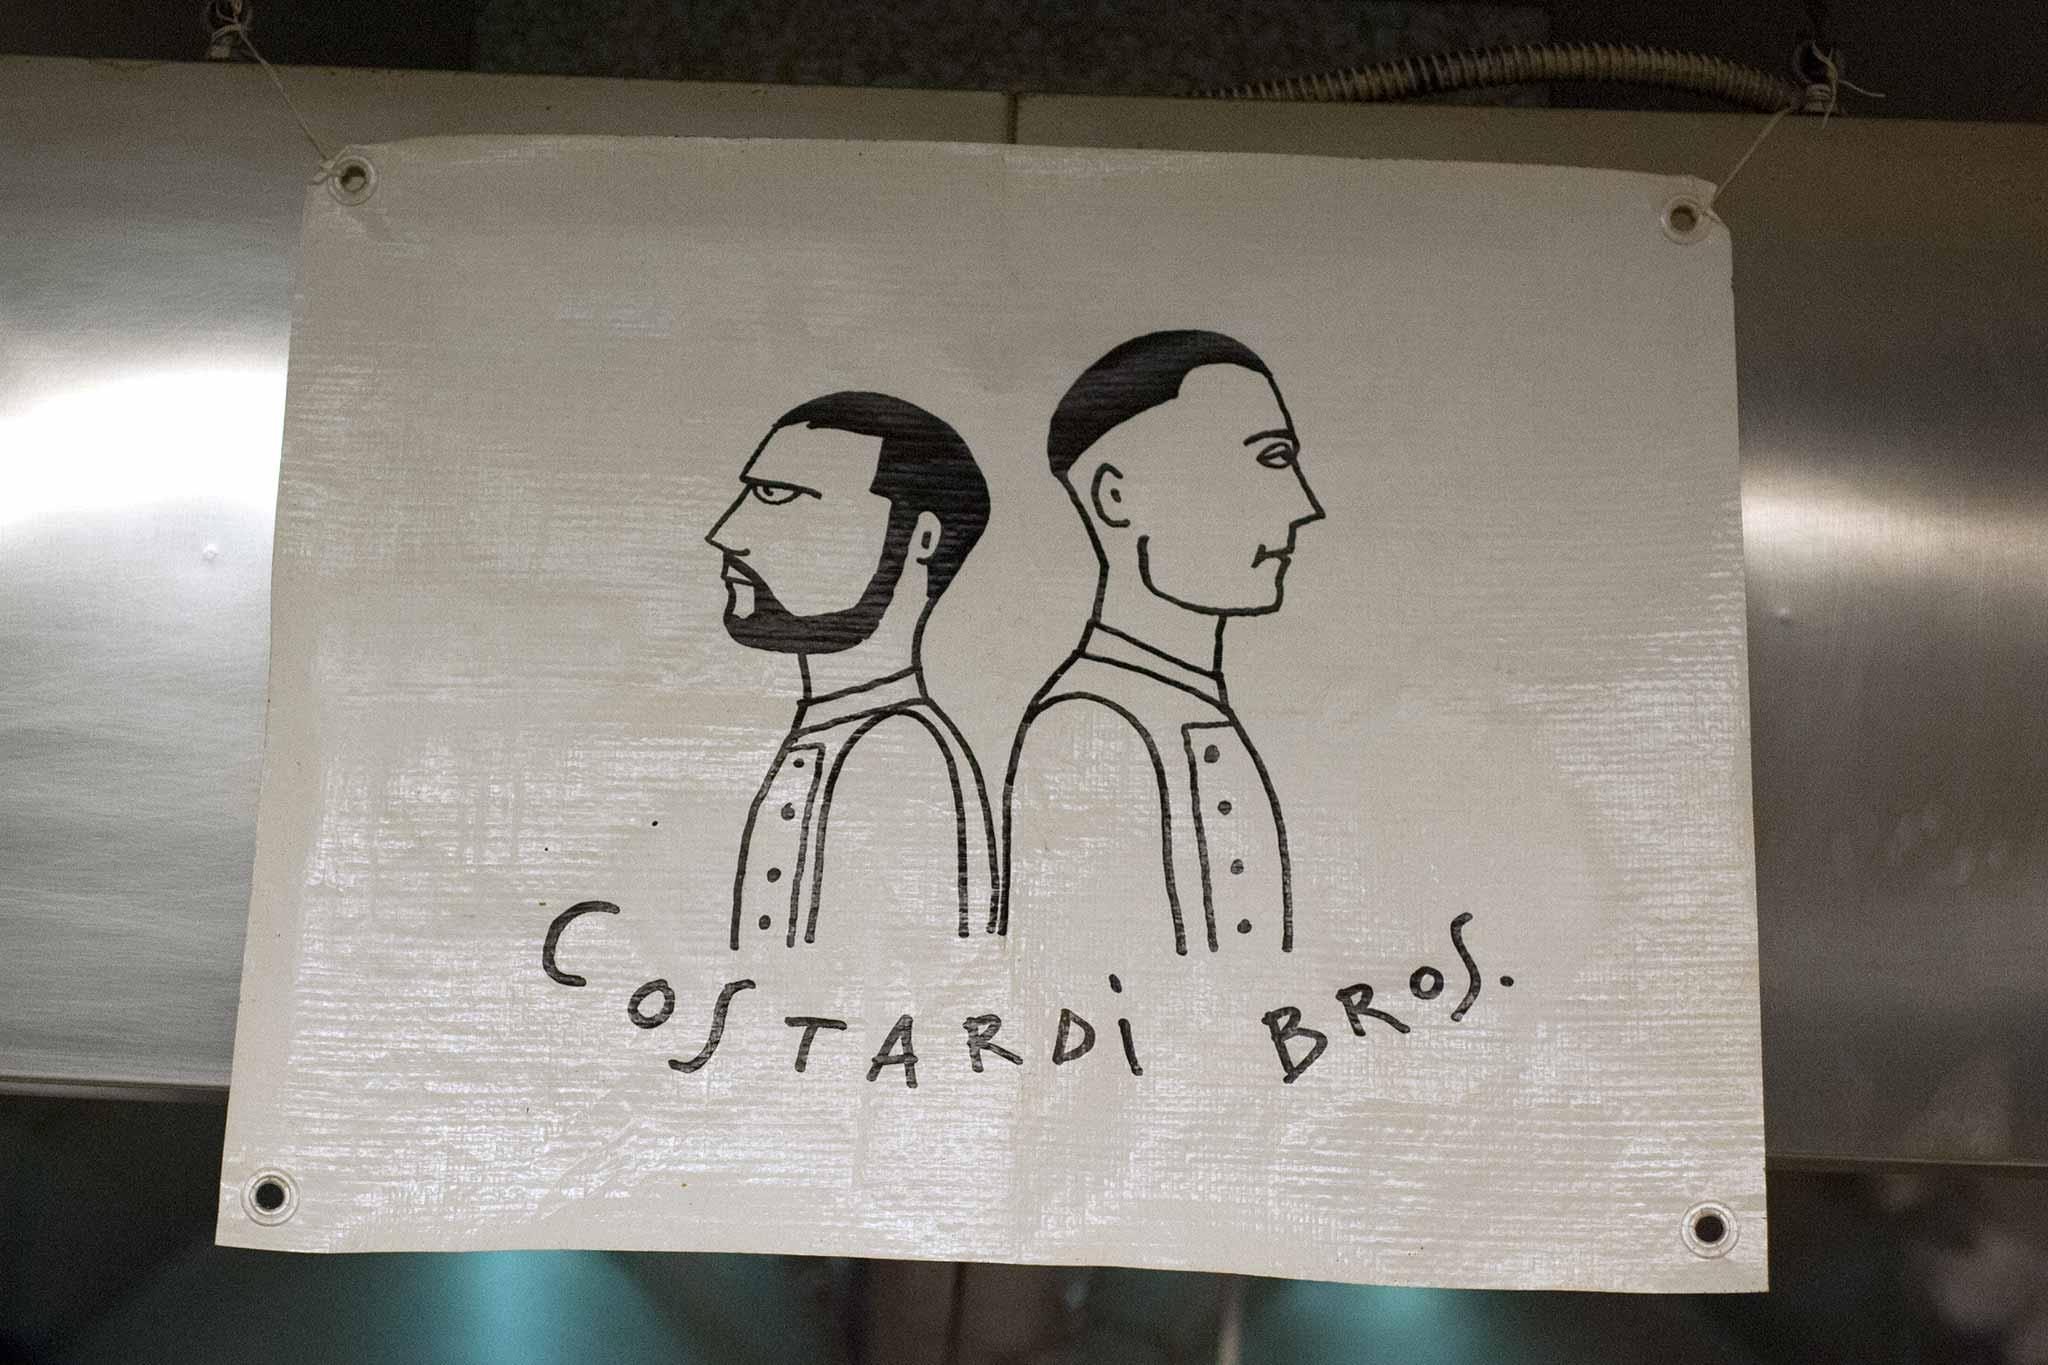 costardi-bros